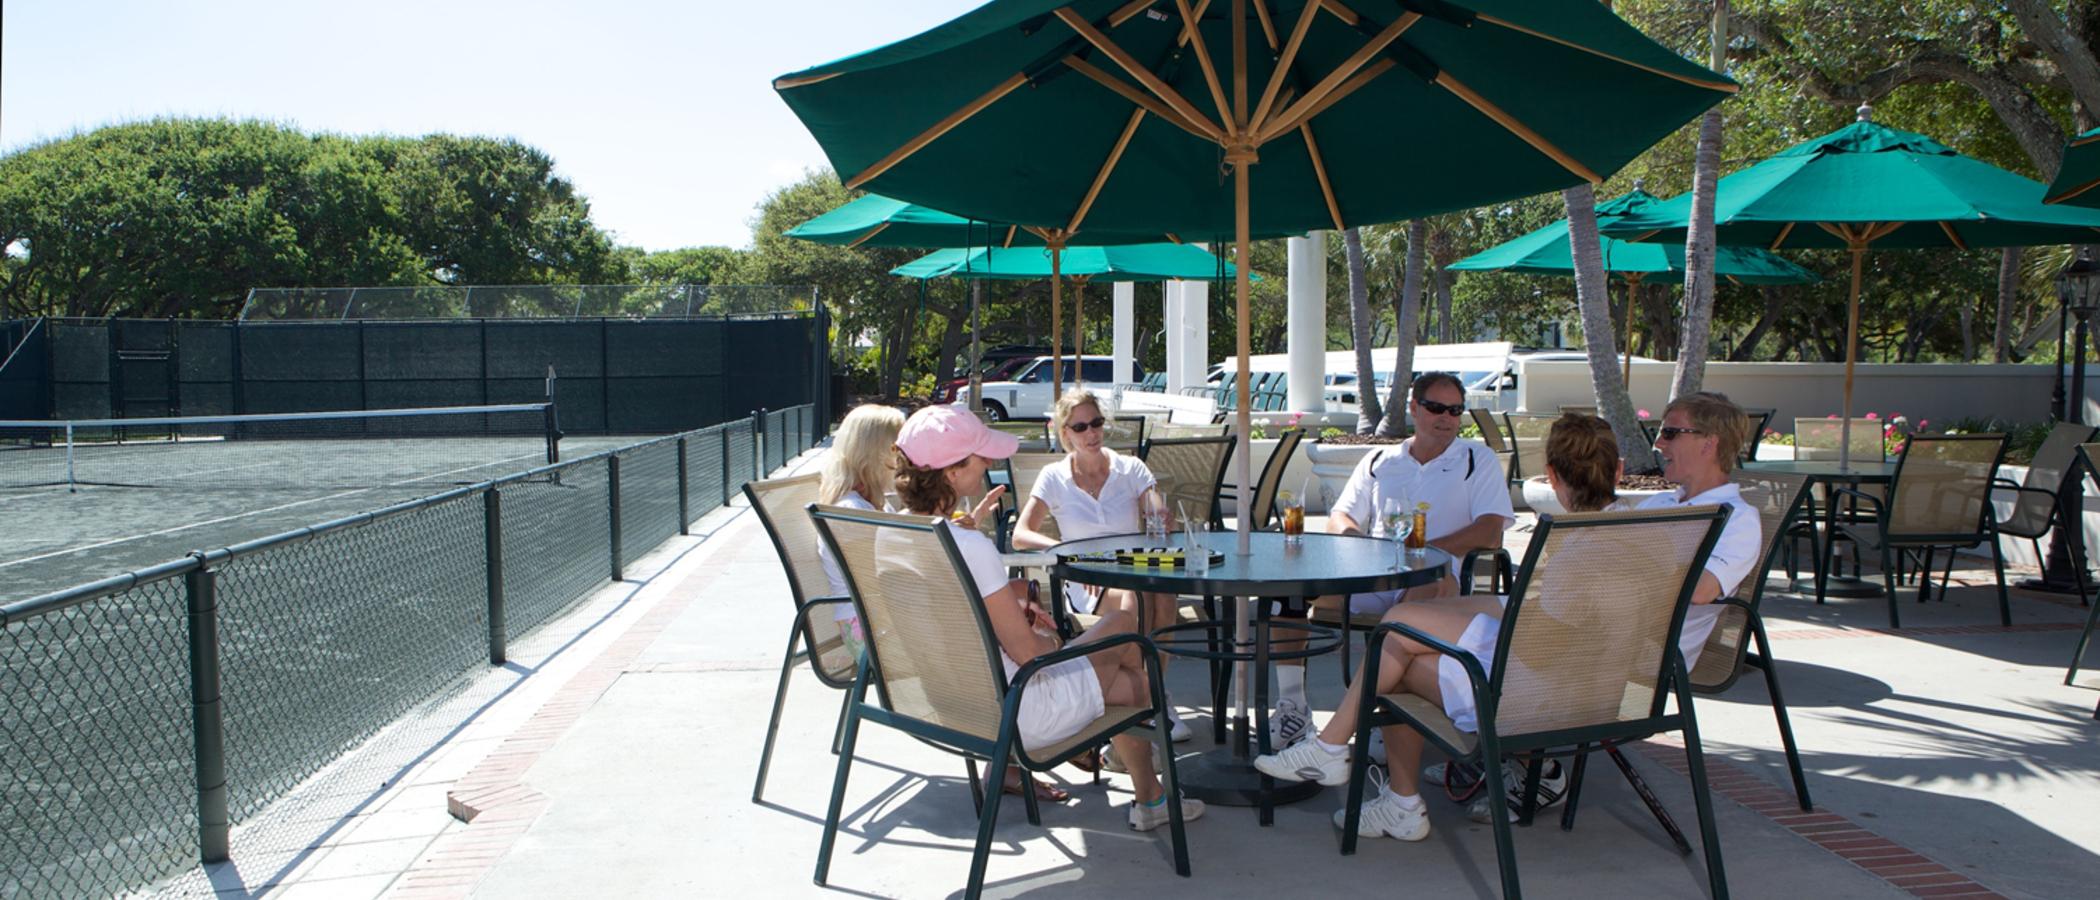 Food & Drink At The John's Island Tennis Club